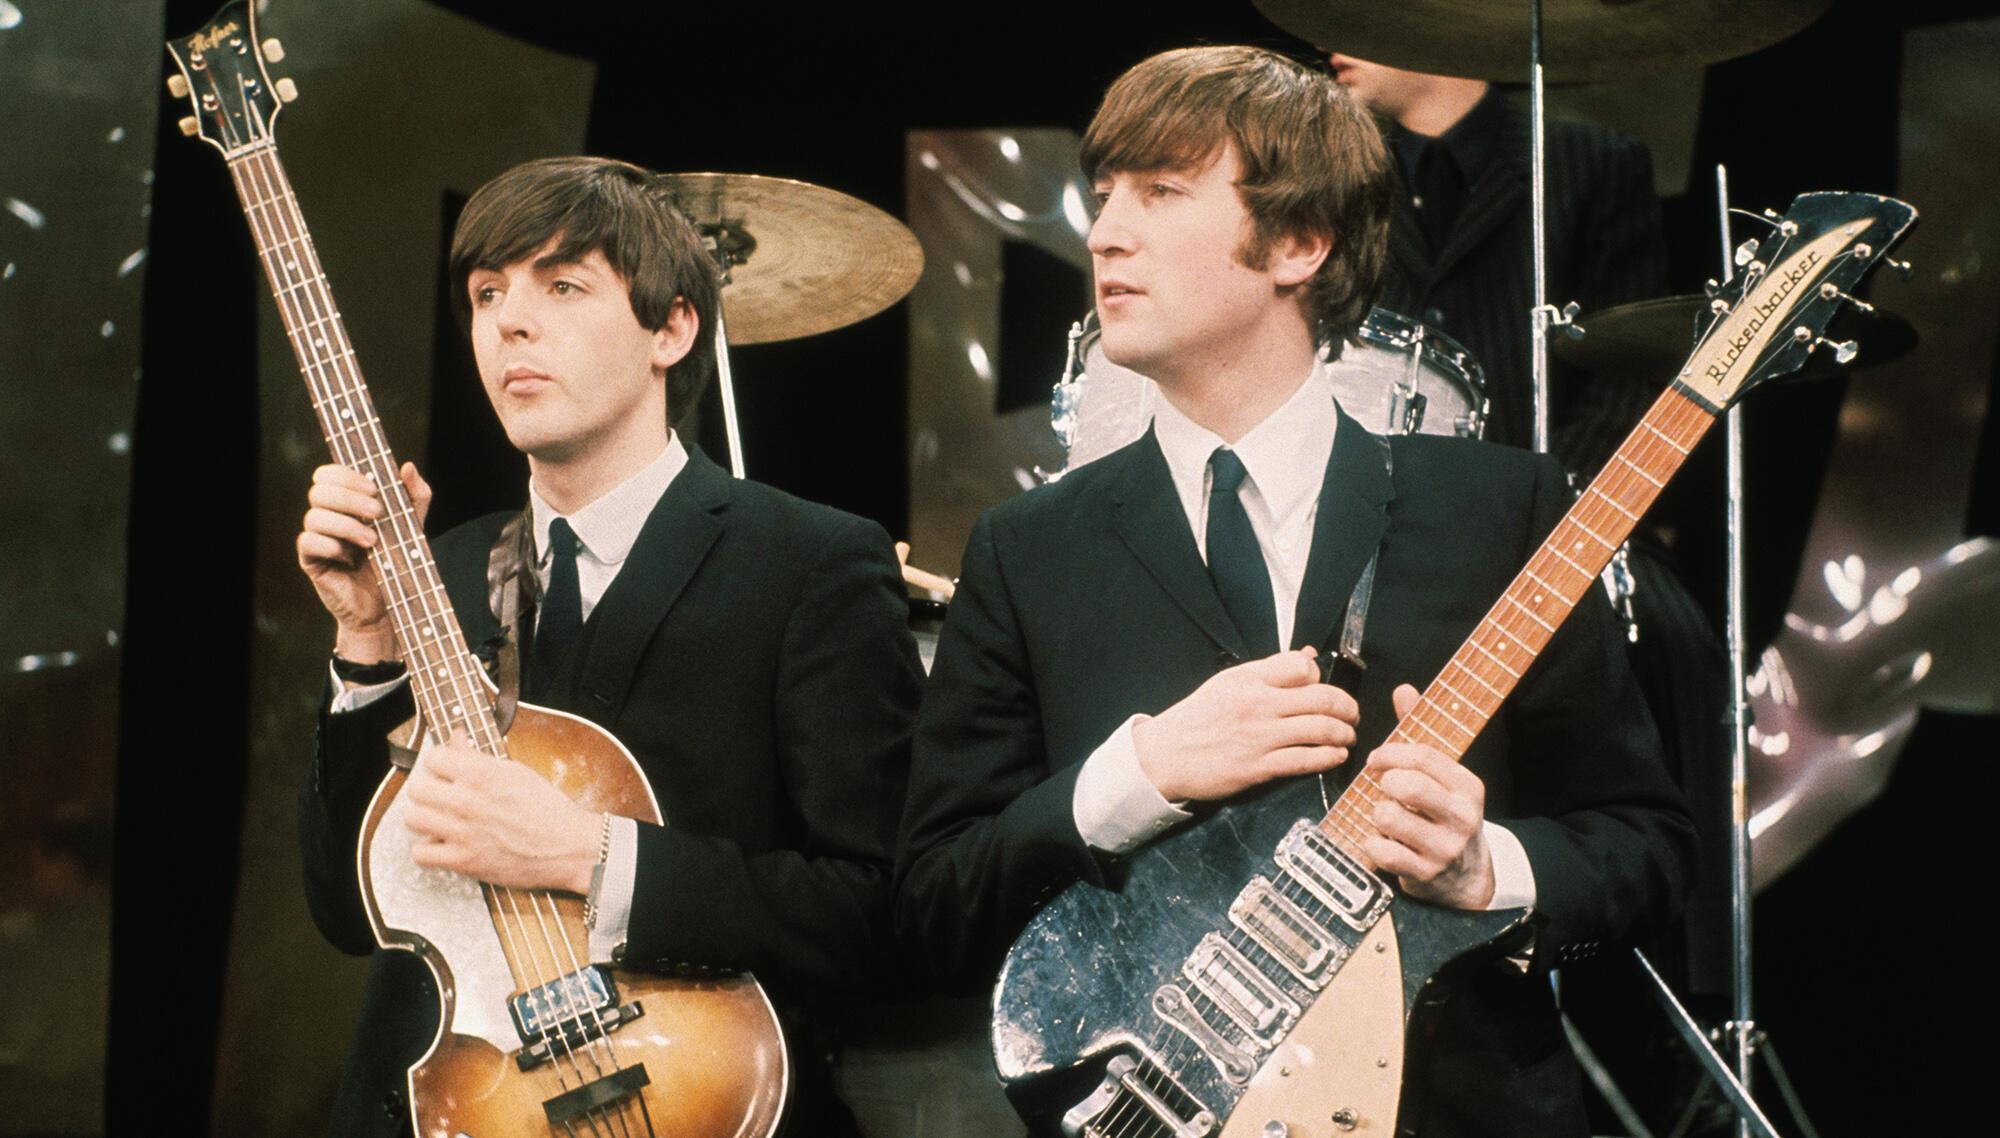 Paul McCartney Says He Still Has Trouble Accepting John Lennon's Murder